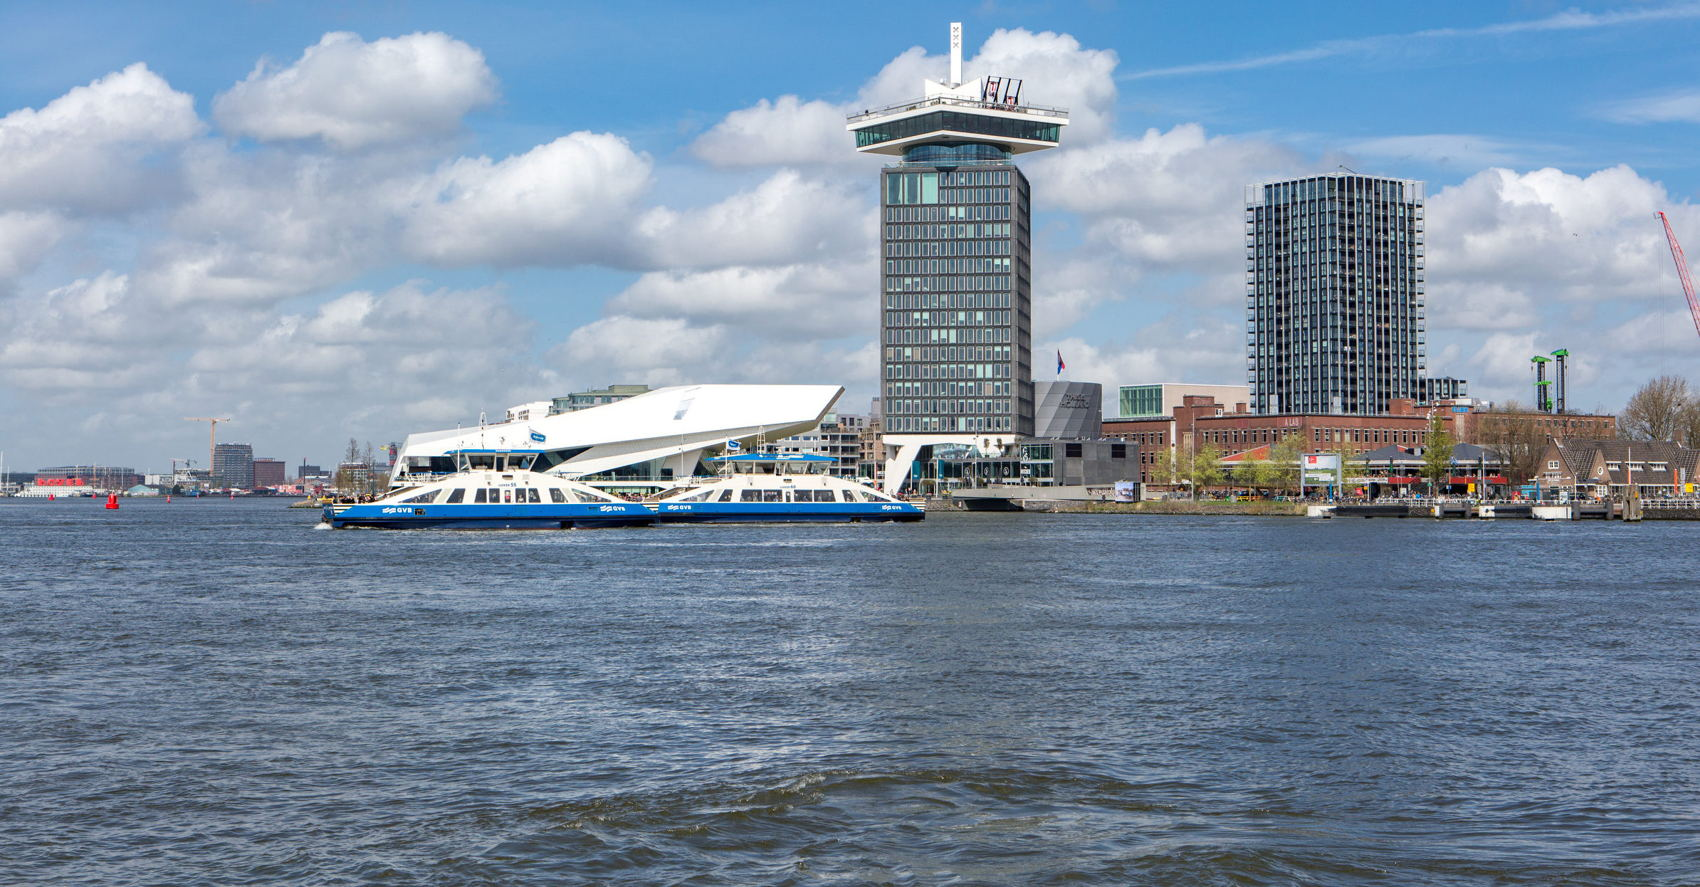 2018 Vervoerregio Amsterdam. Foto: Wiebke Wilting